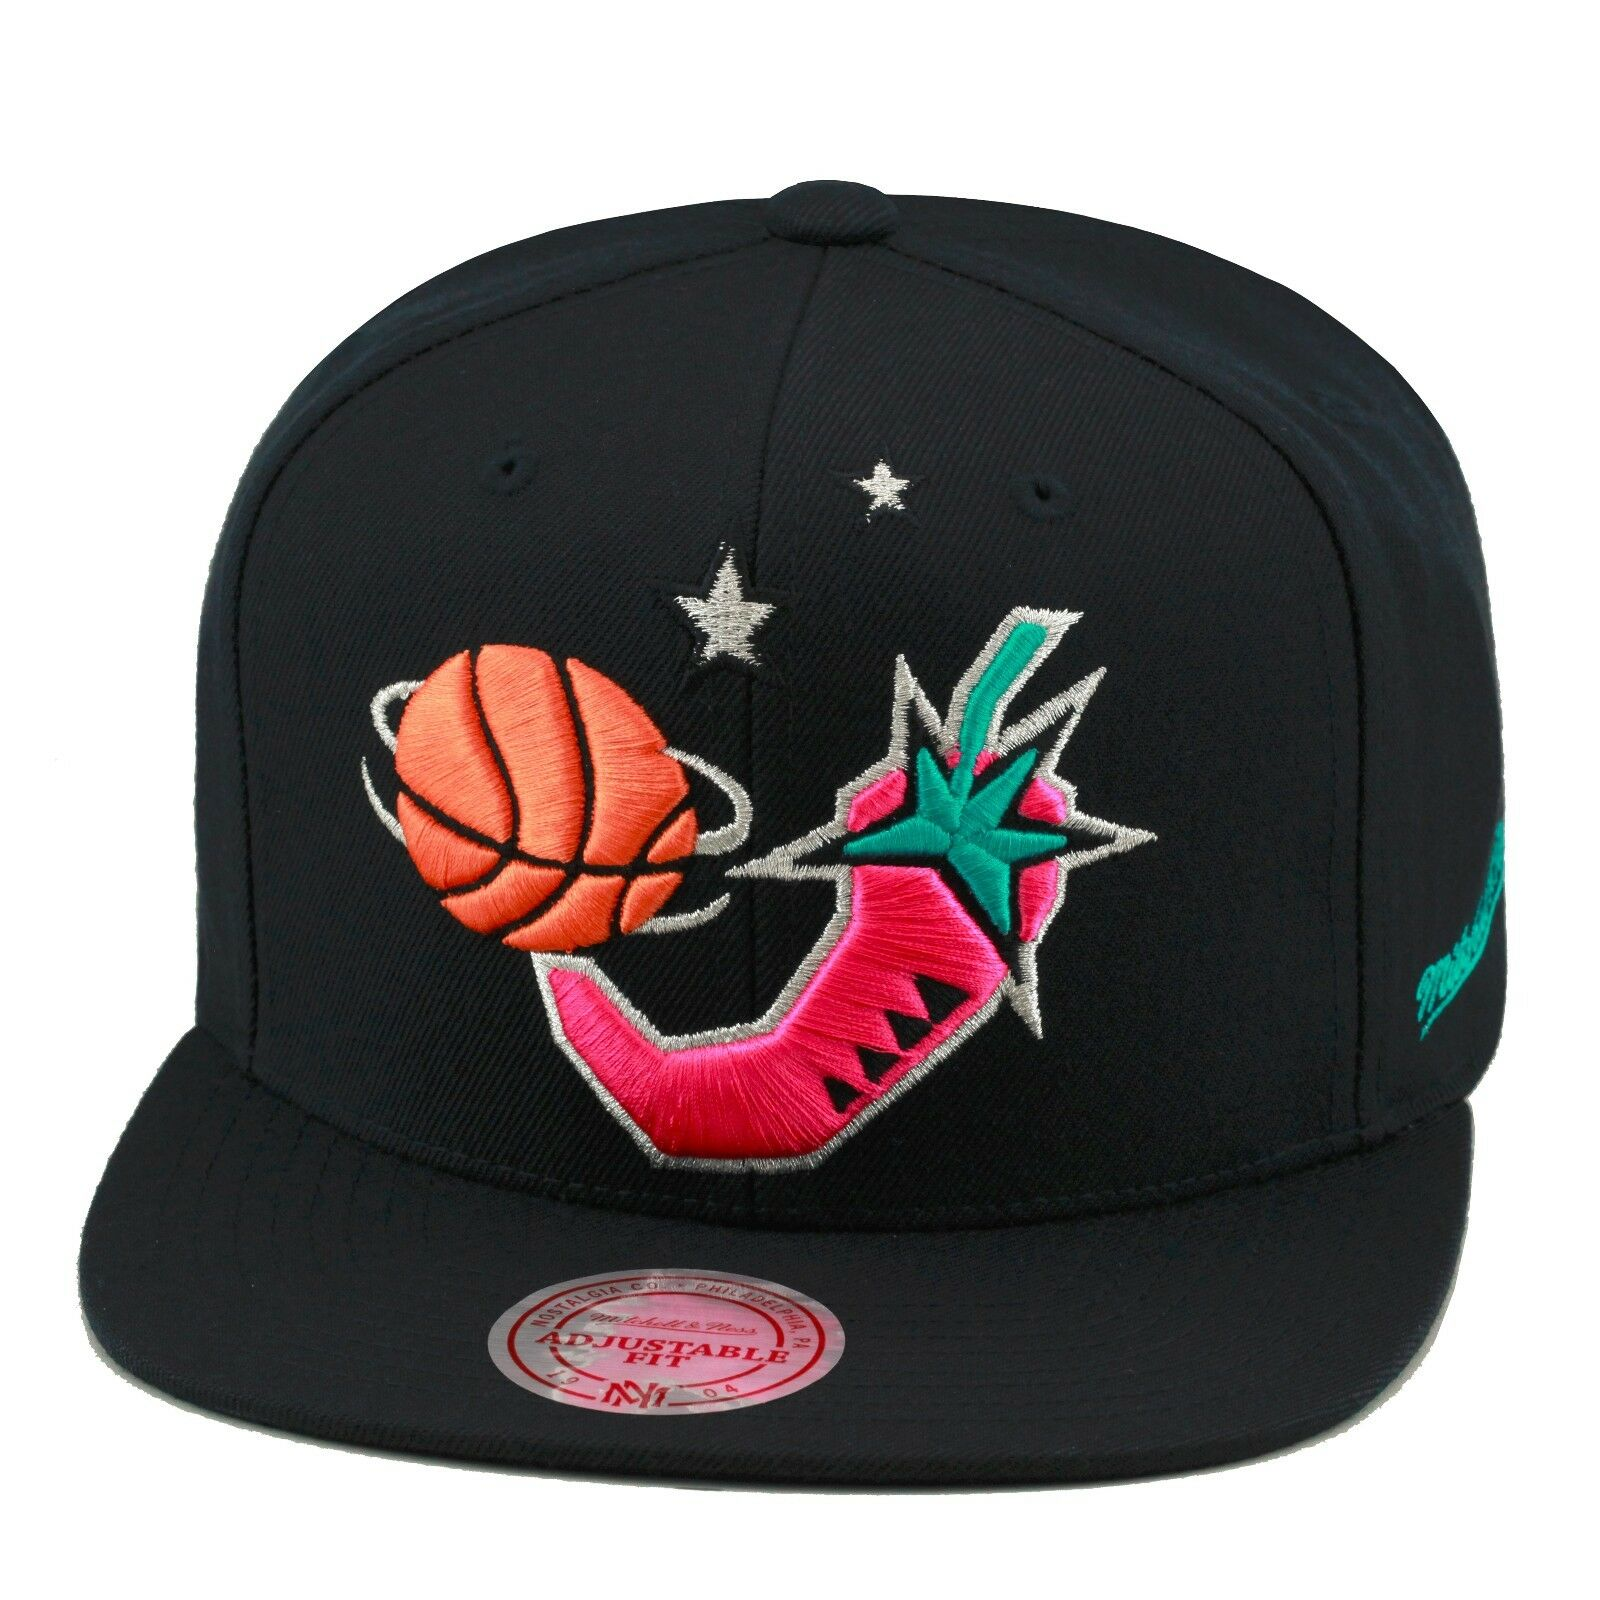 Mitchell Snapback & Ness NBA All Star Game 1996 Snapback Mitchell Hat BLACK/Pink Pepper/BLACK BOT 20c5b0